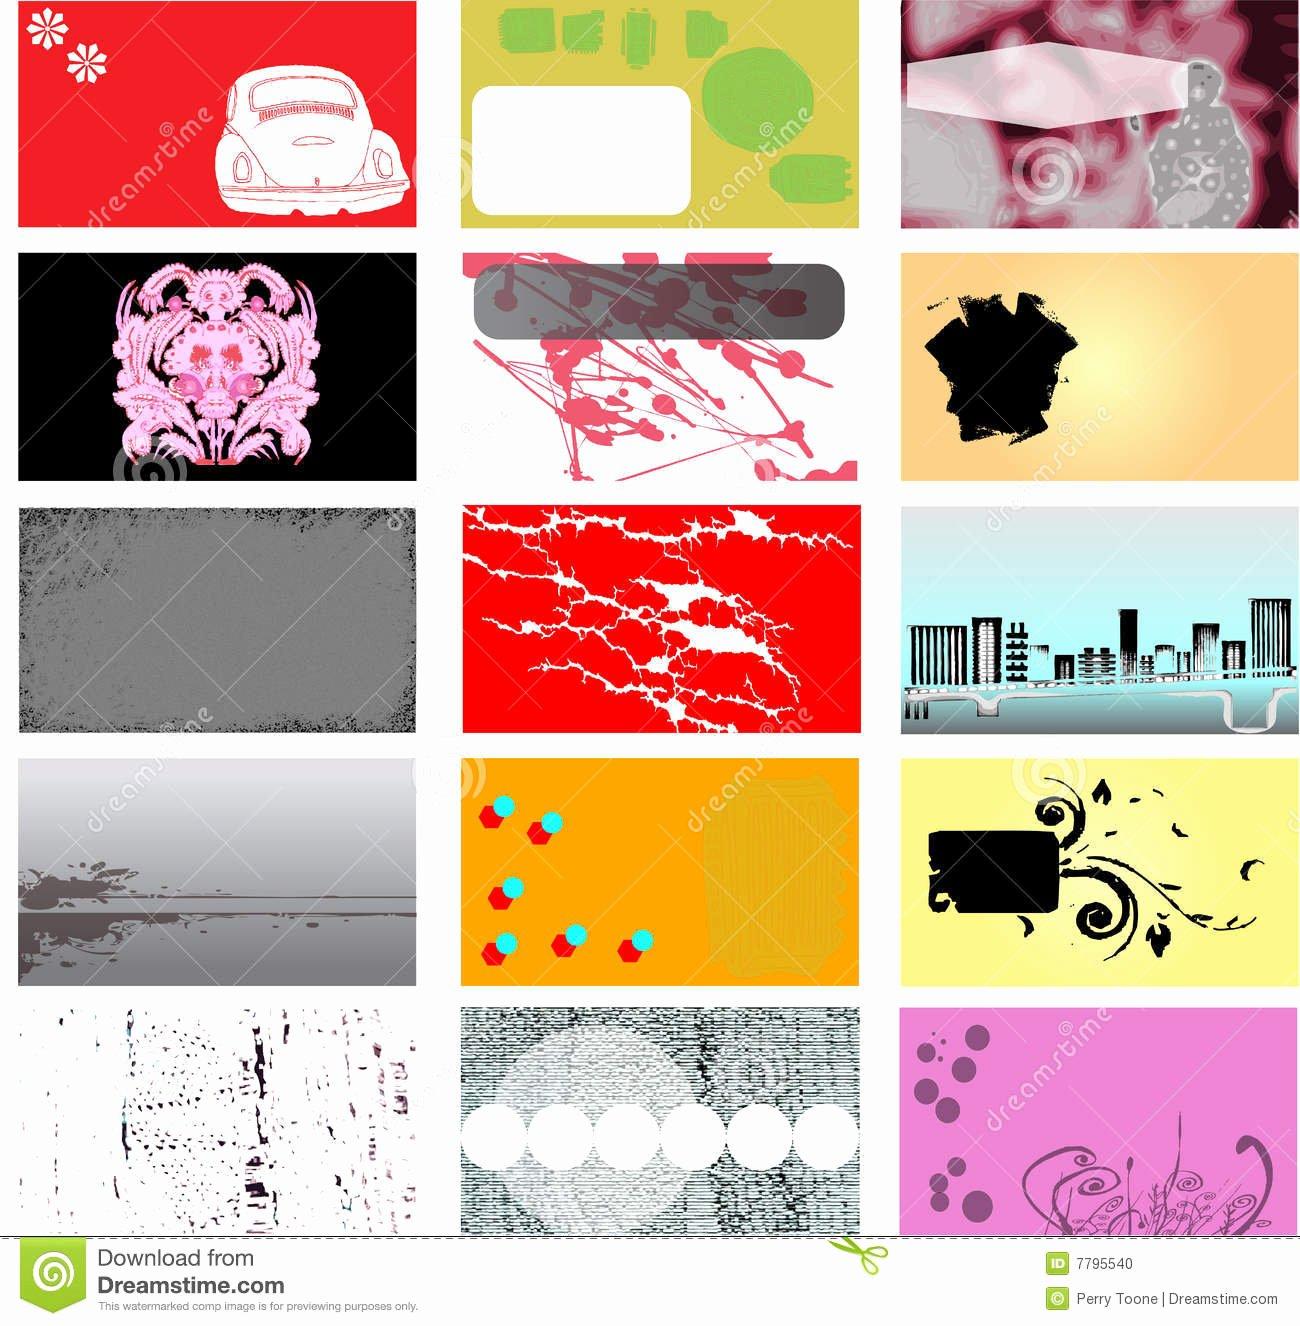 Cool Debit Card Designs Inspirational Cool Debit Card Designs